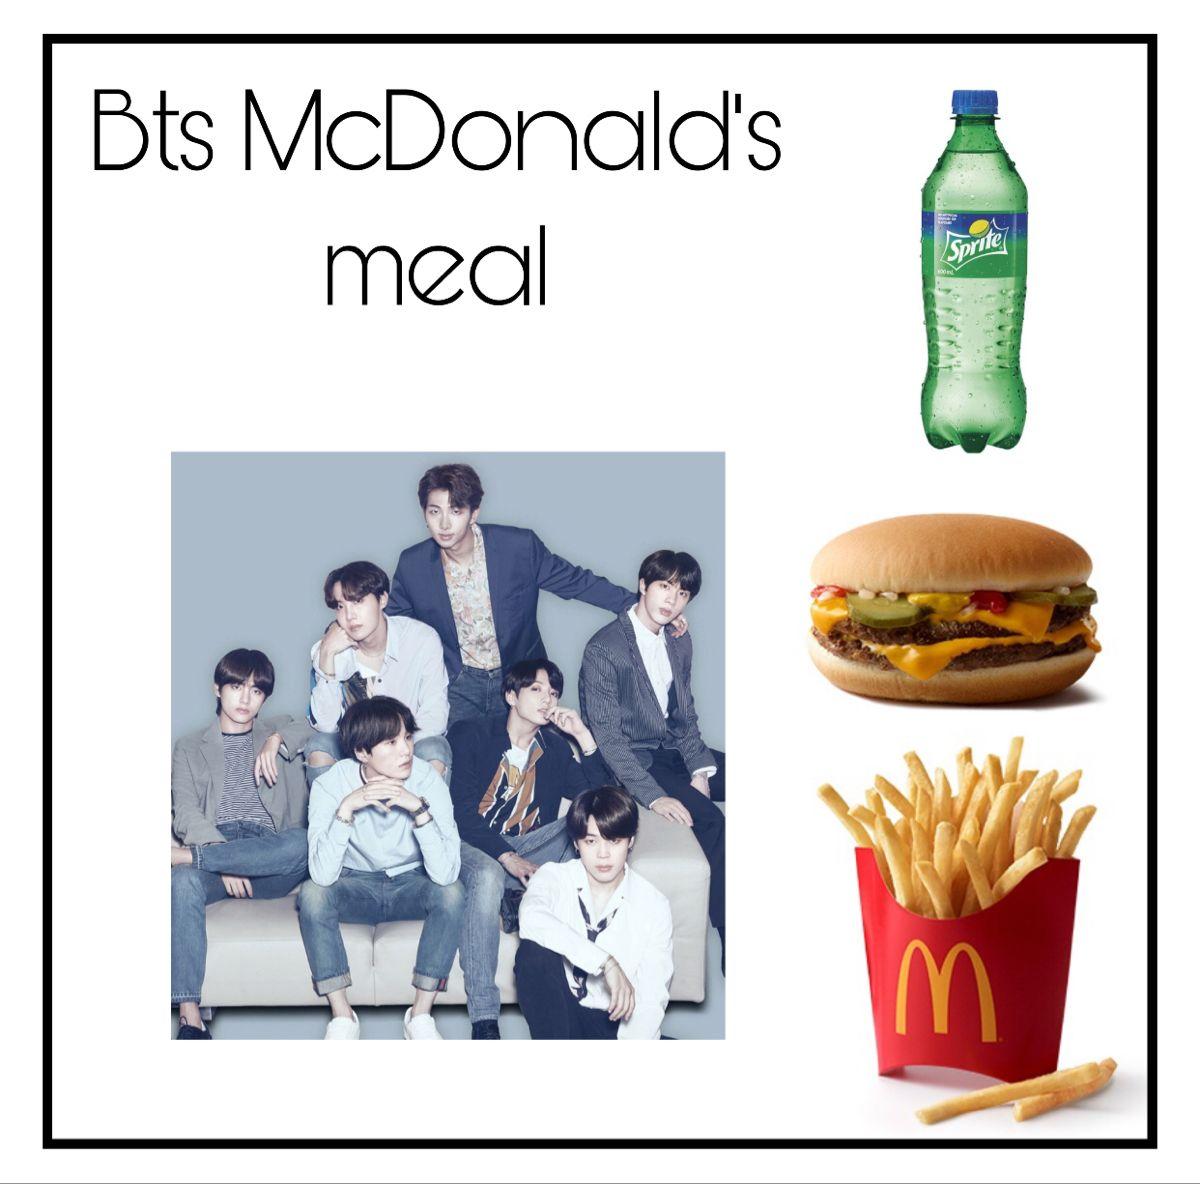 Bts Mcdonald S Menu Kpop Mcdonalds Movie Posters Bts mcdonald's meal wallpaper